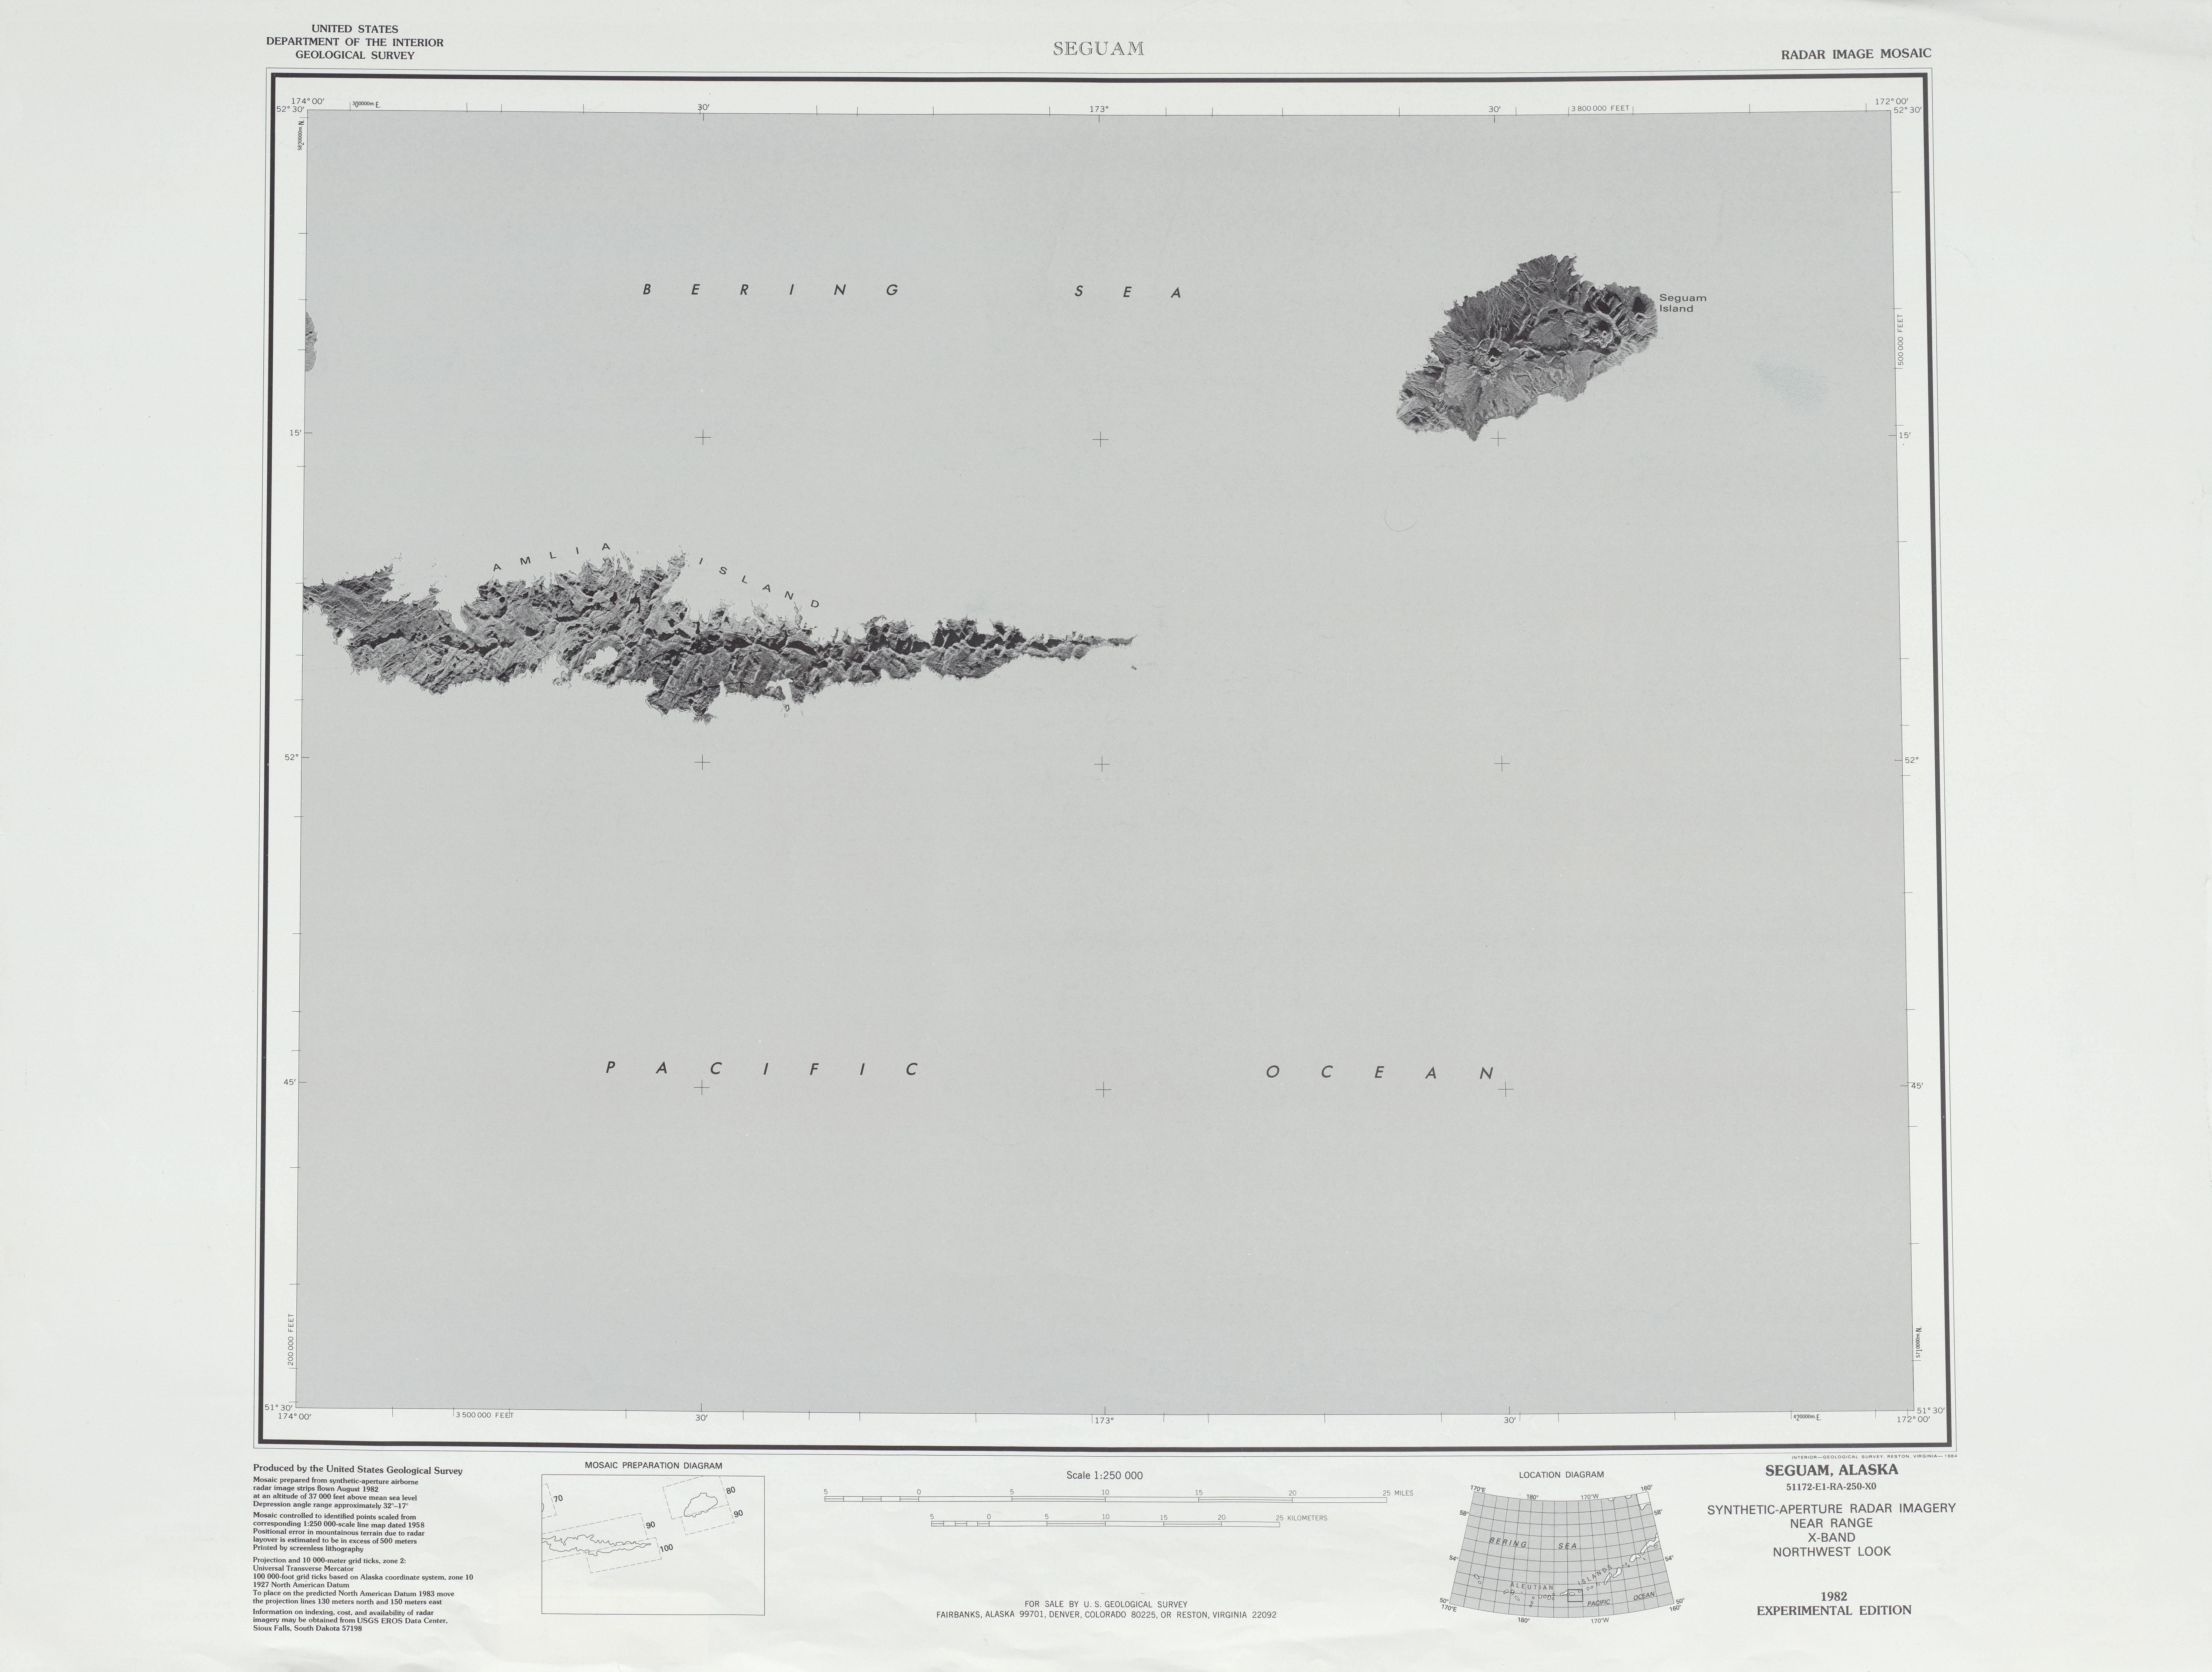 Seguam Radar Image Mosaic Sheet, United States 1983